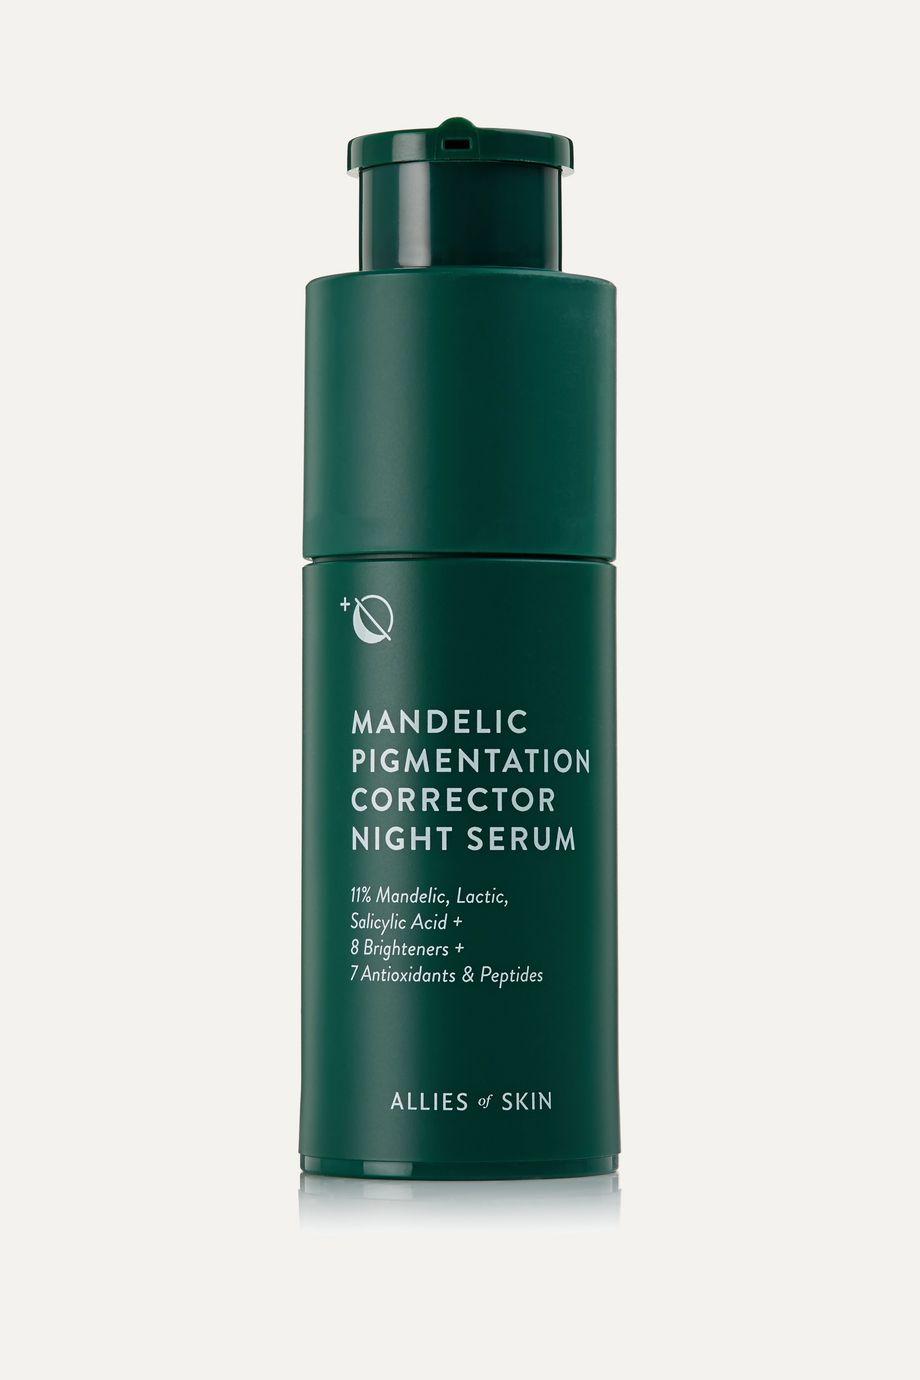 Allies of Skin Mandelic Pigmentation Corrector Night Serum, 30ml